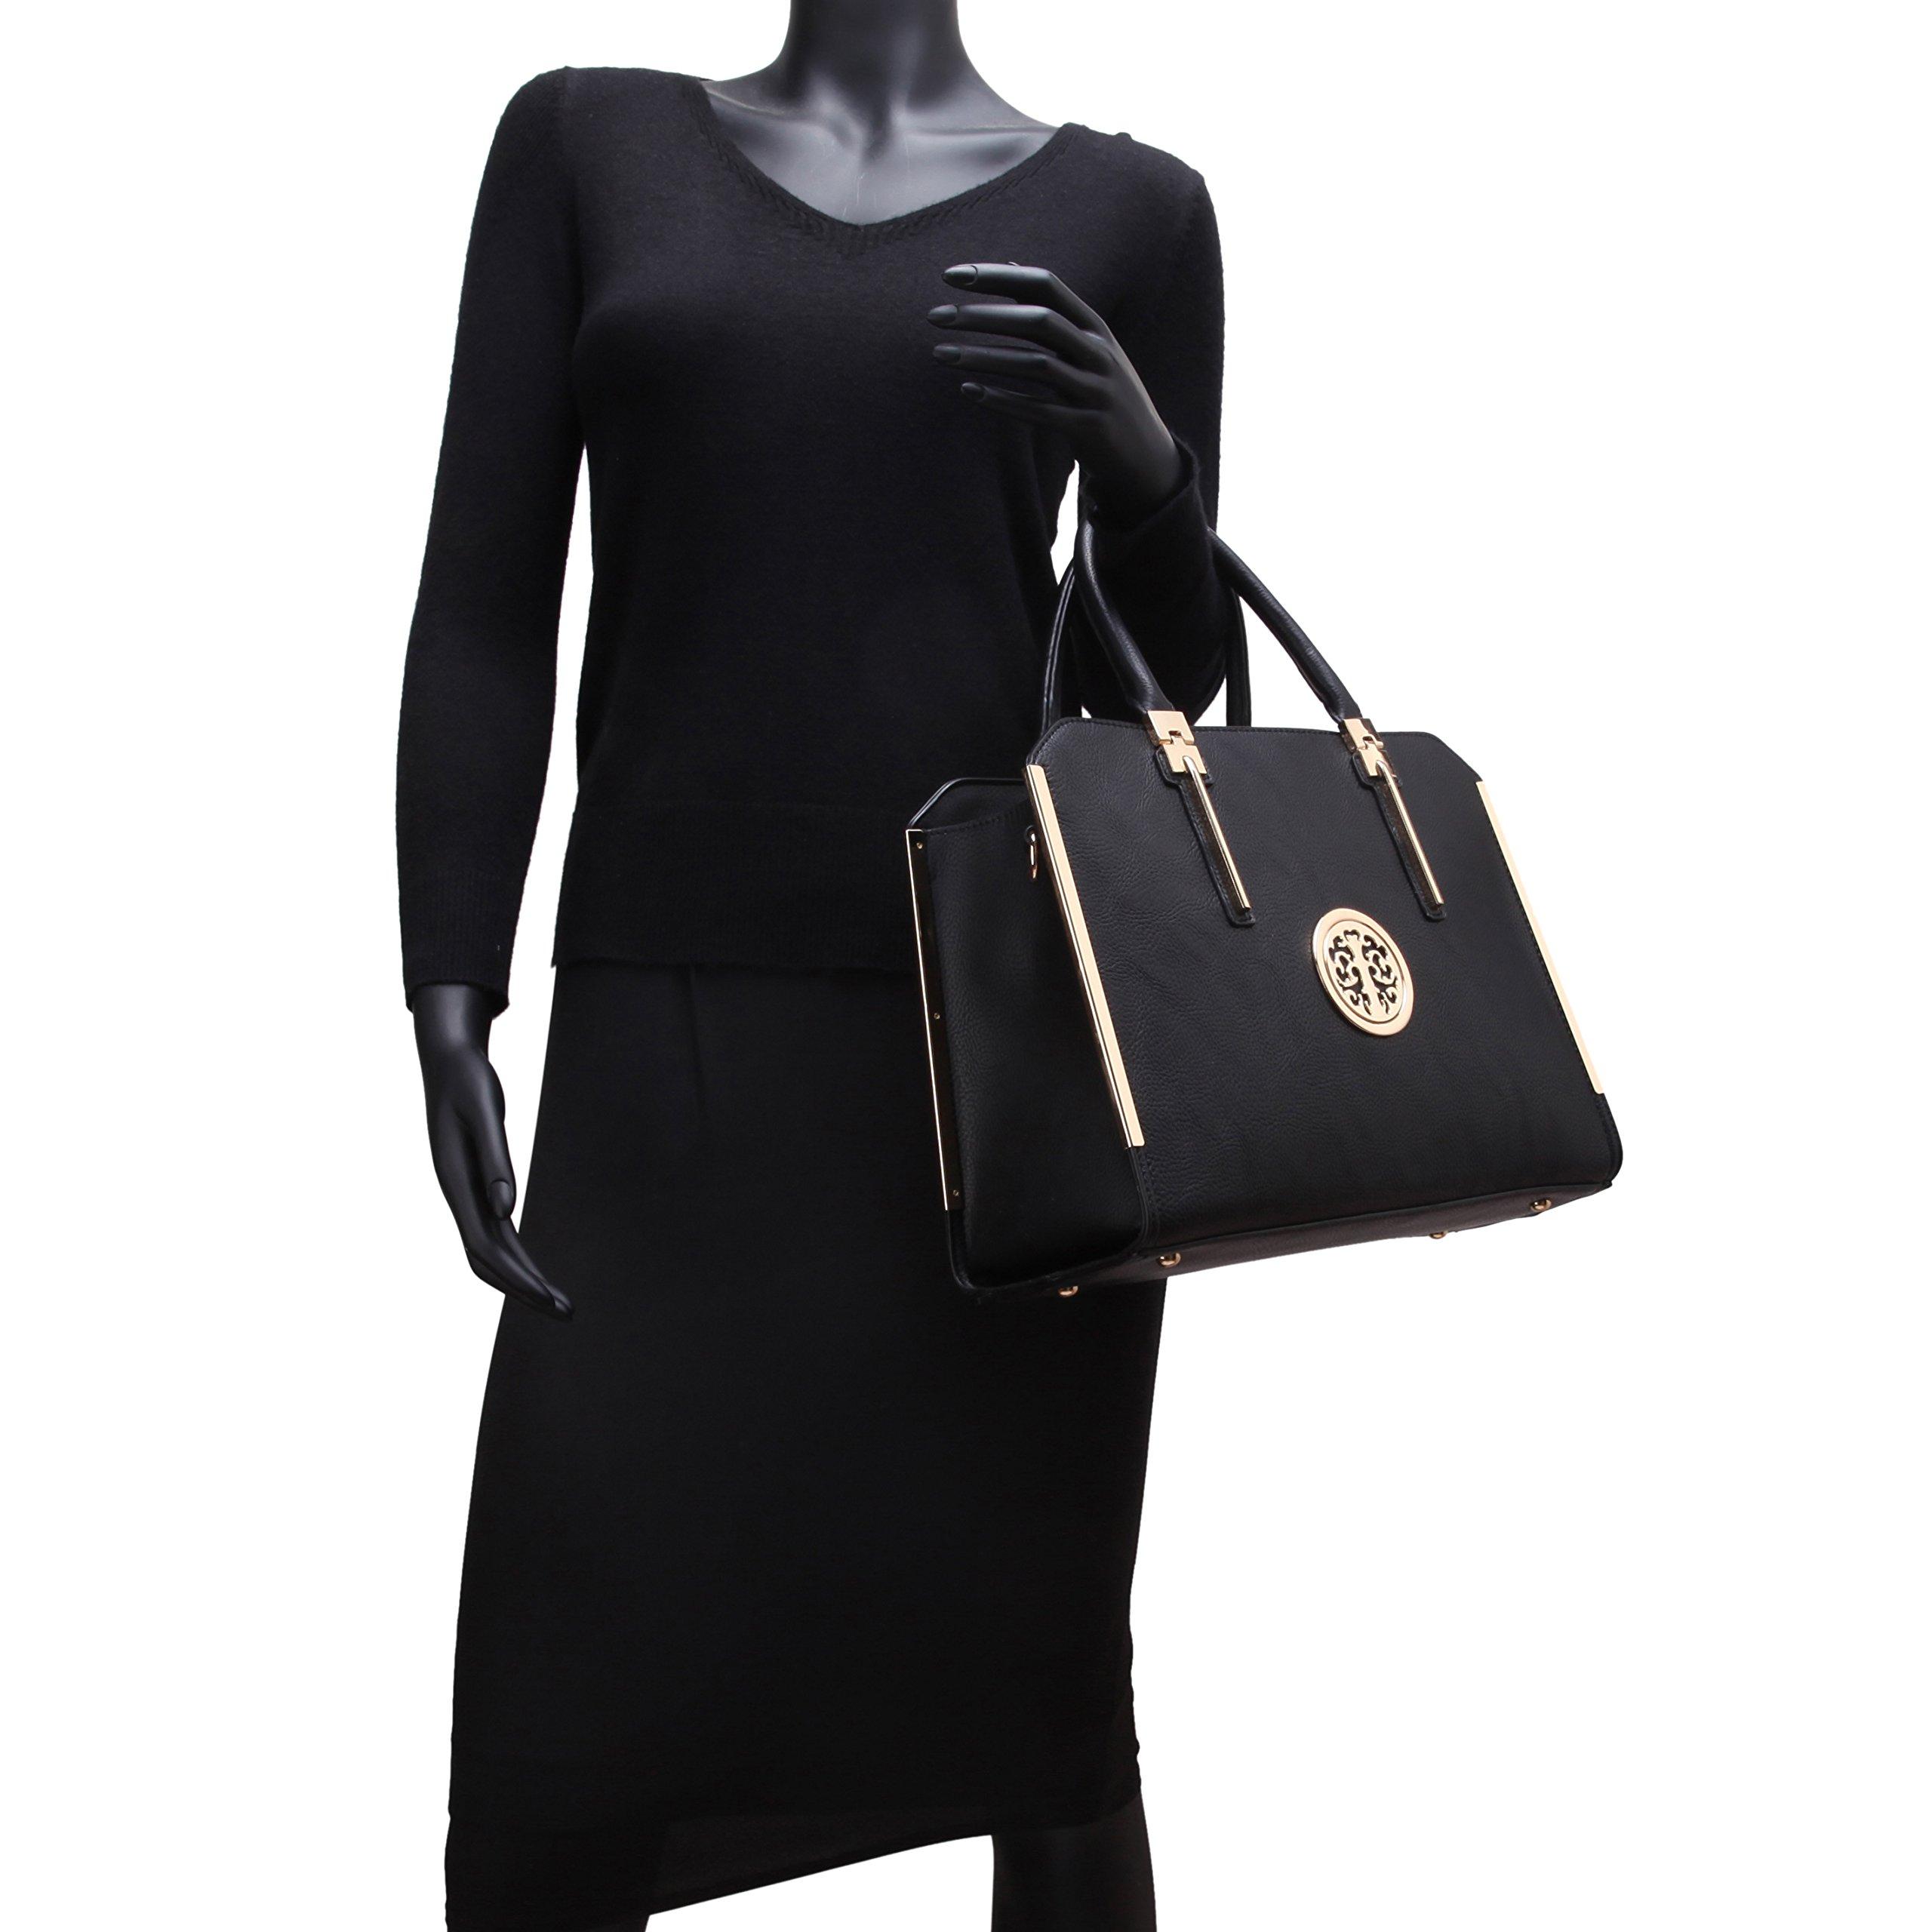 Womens Handbags Designer Satchel Tote Bag Shoulder Bags Ladies Purses for Women Matching Wallet